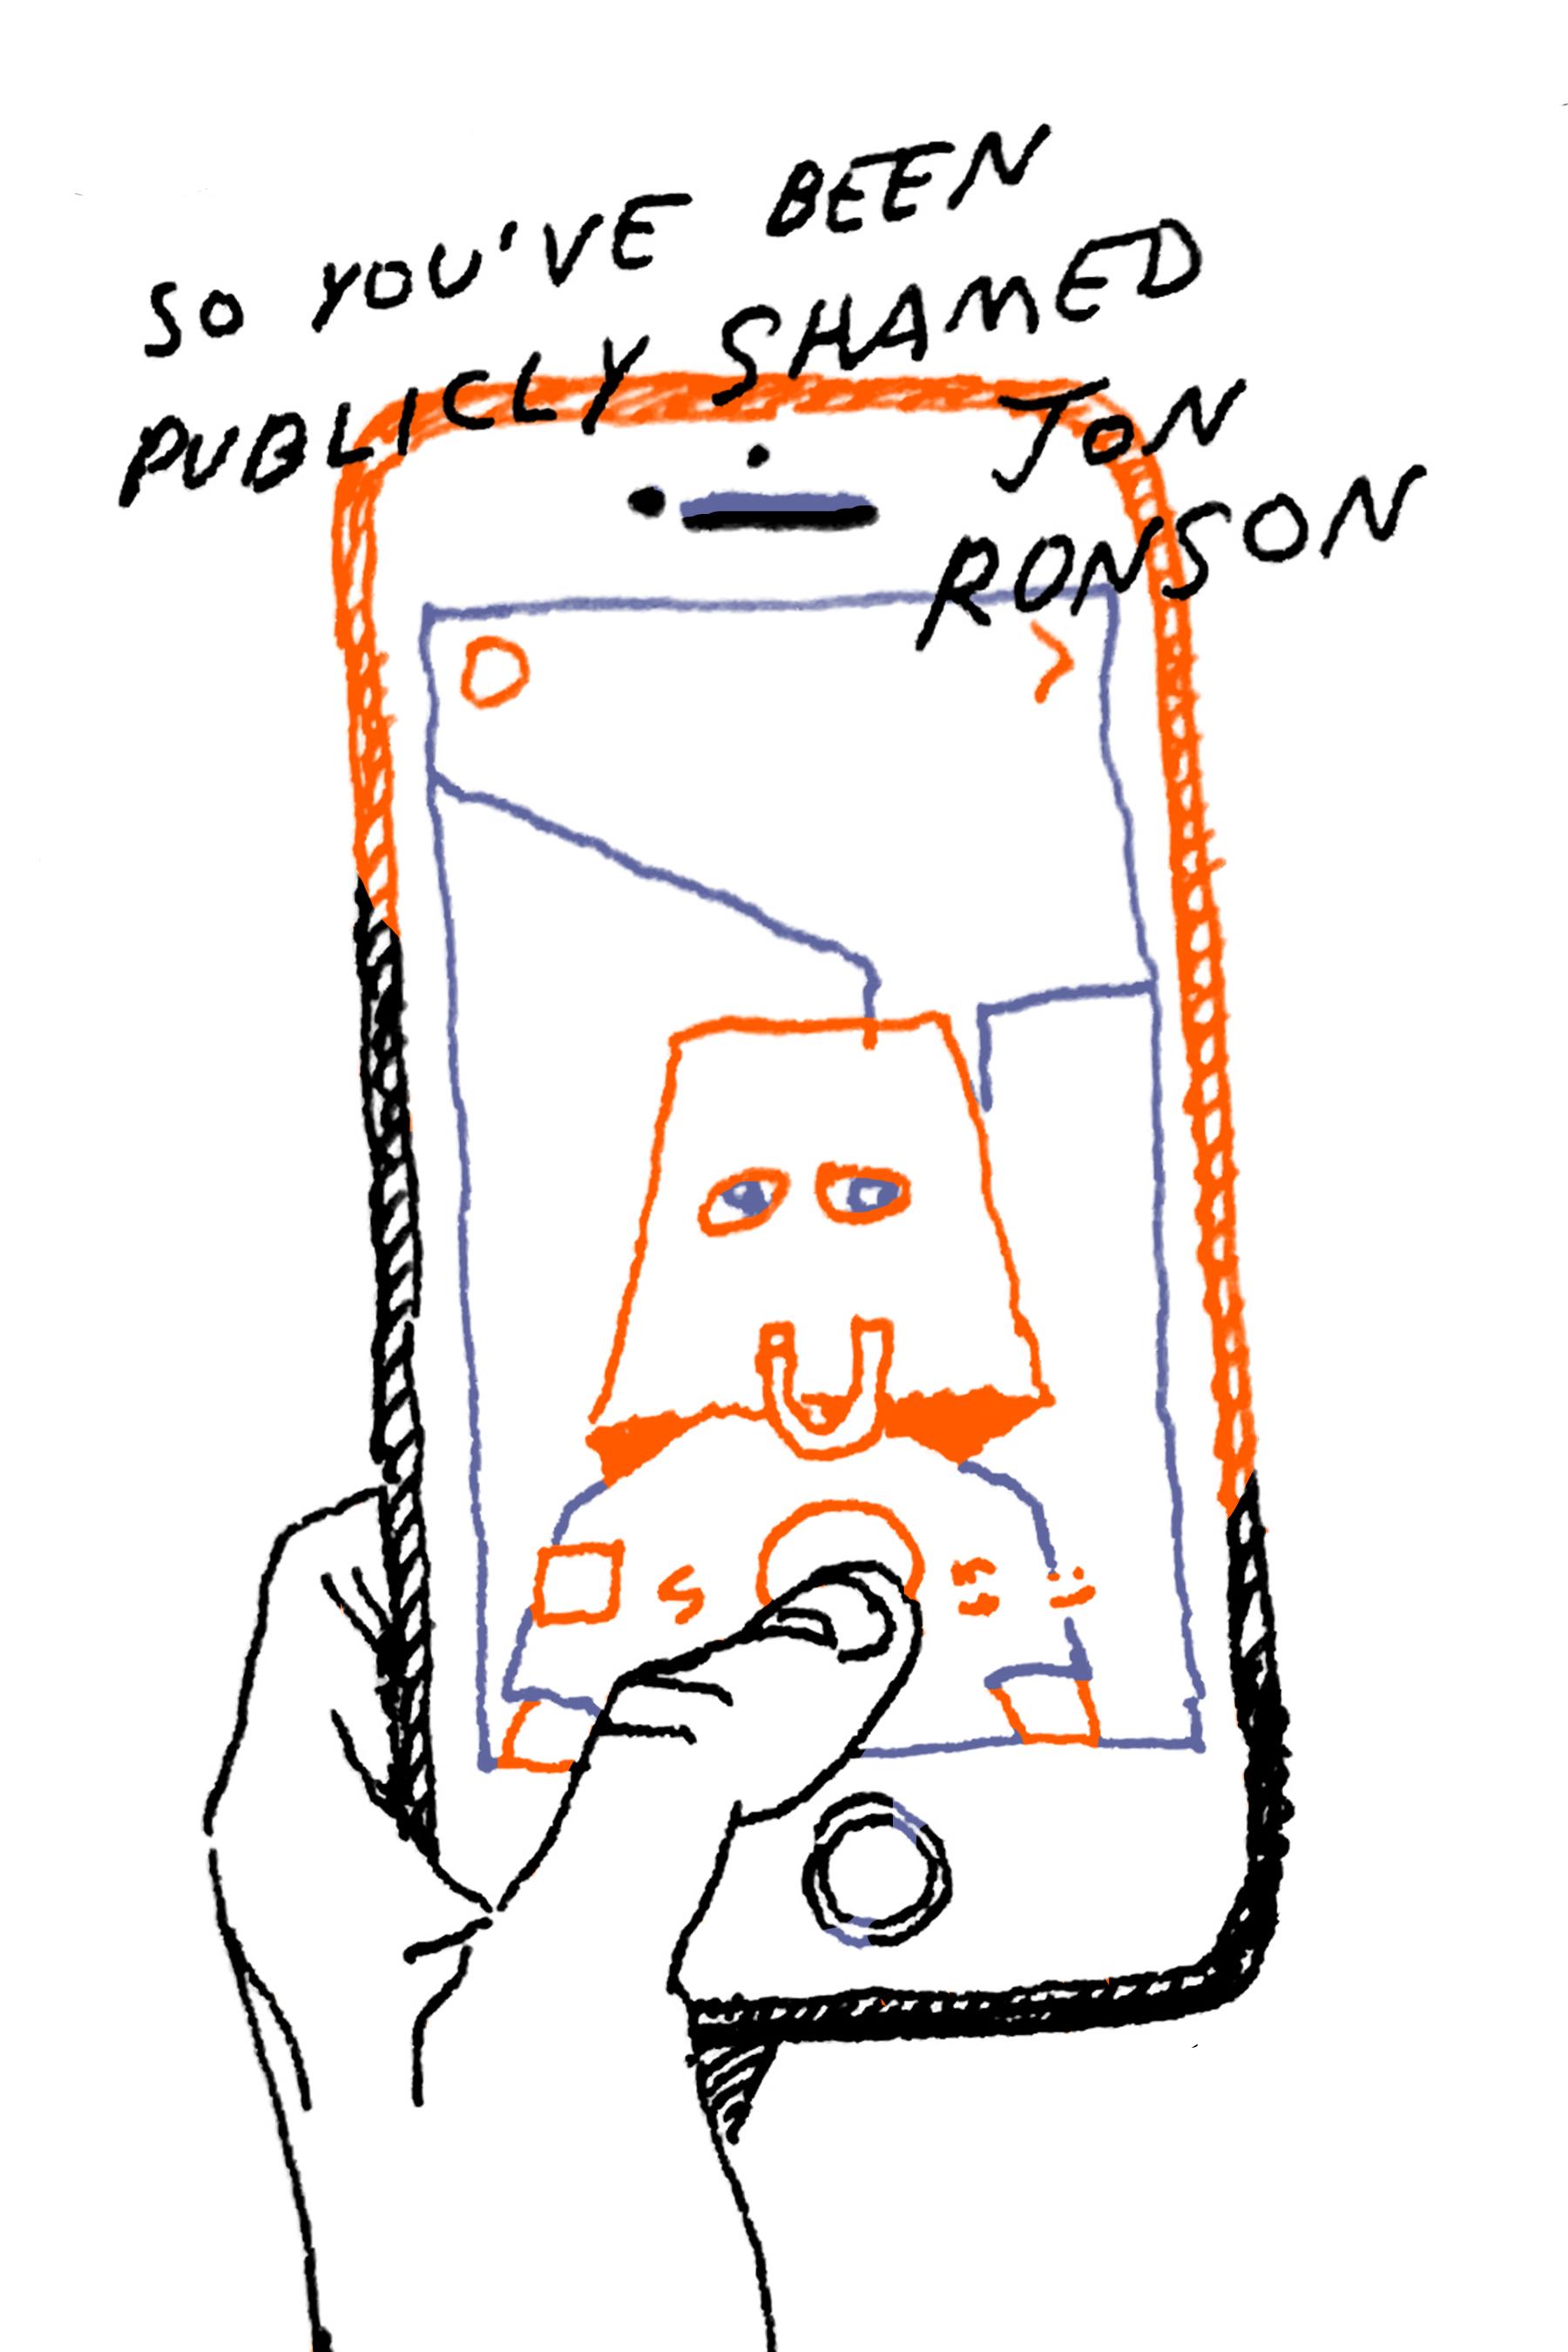 jon ronson.png